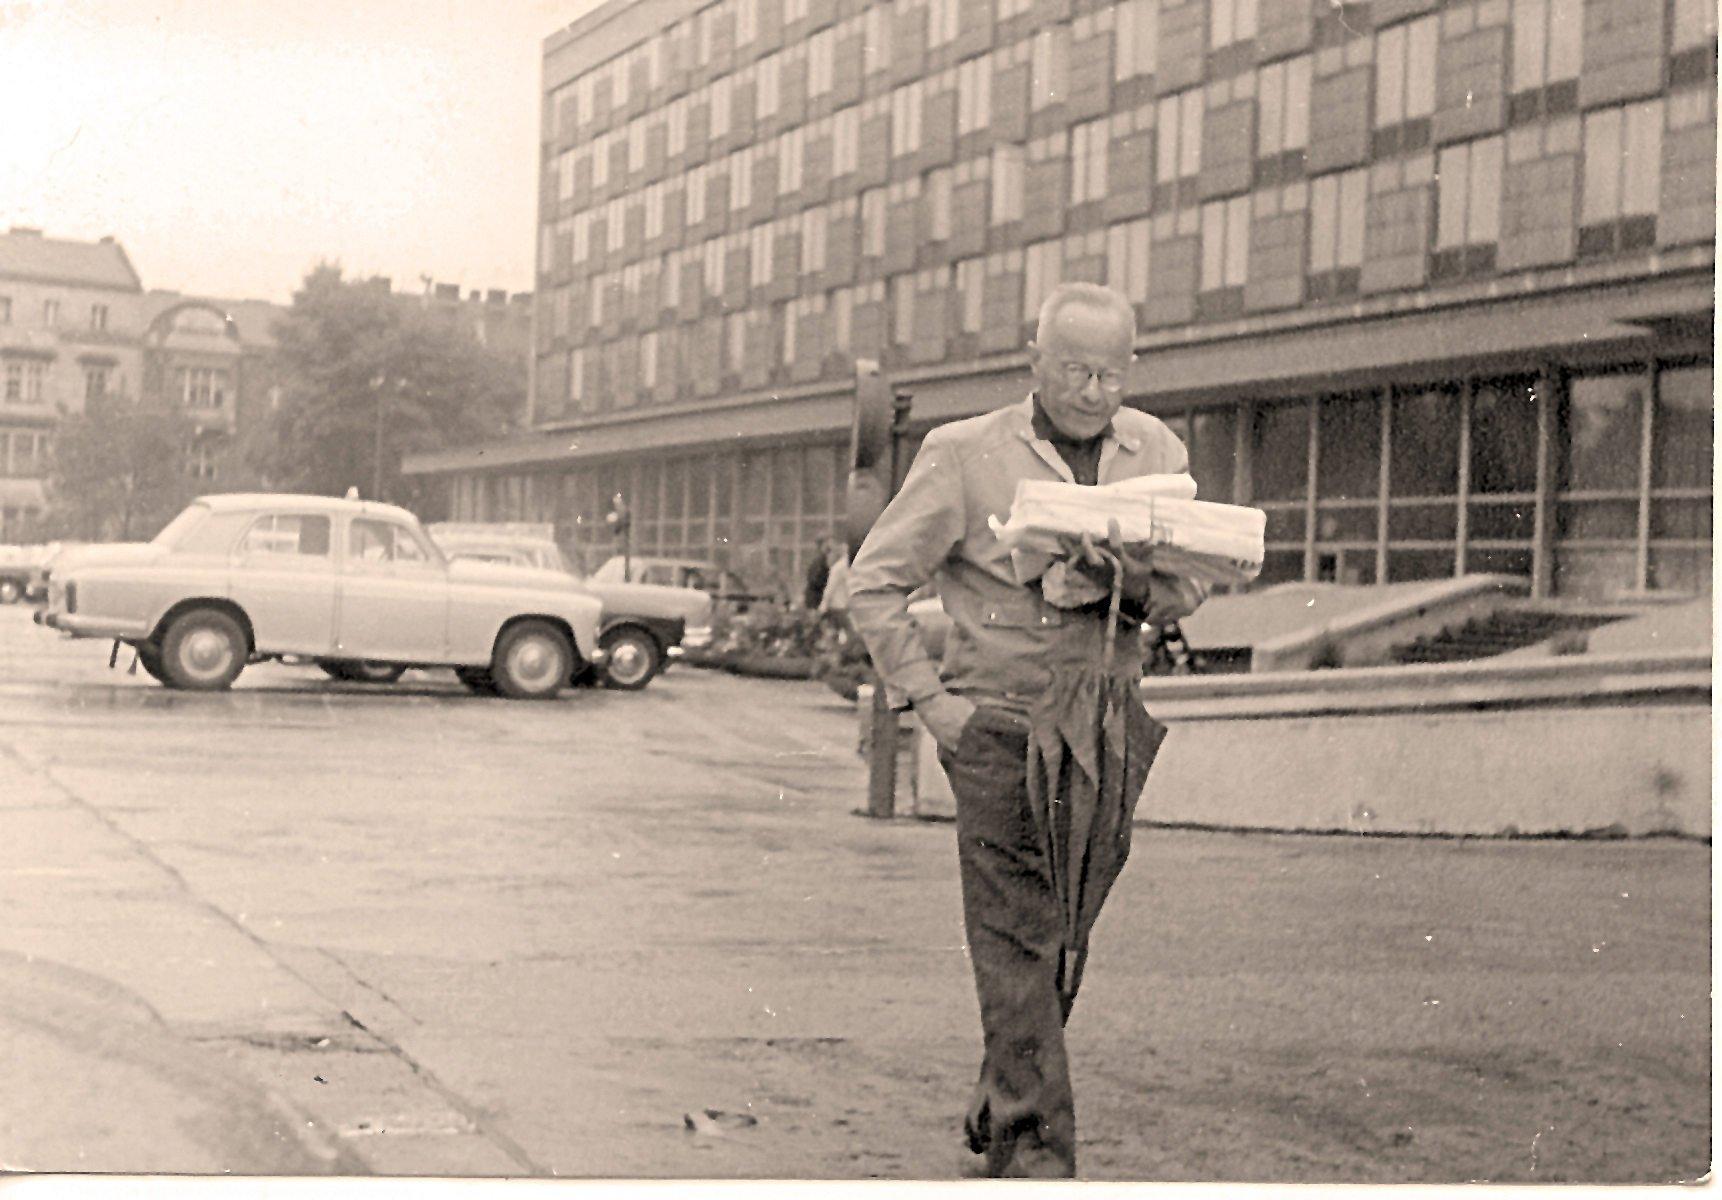 1971_StanislawLem-HotelCracovia